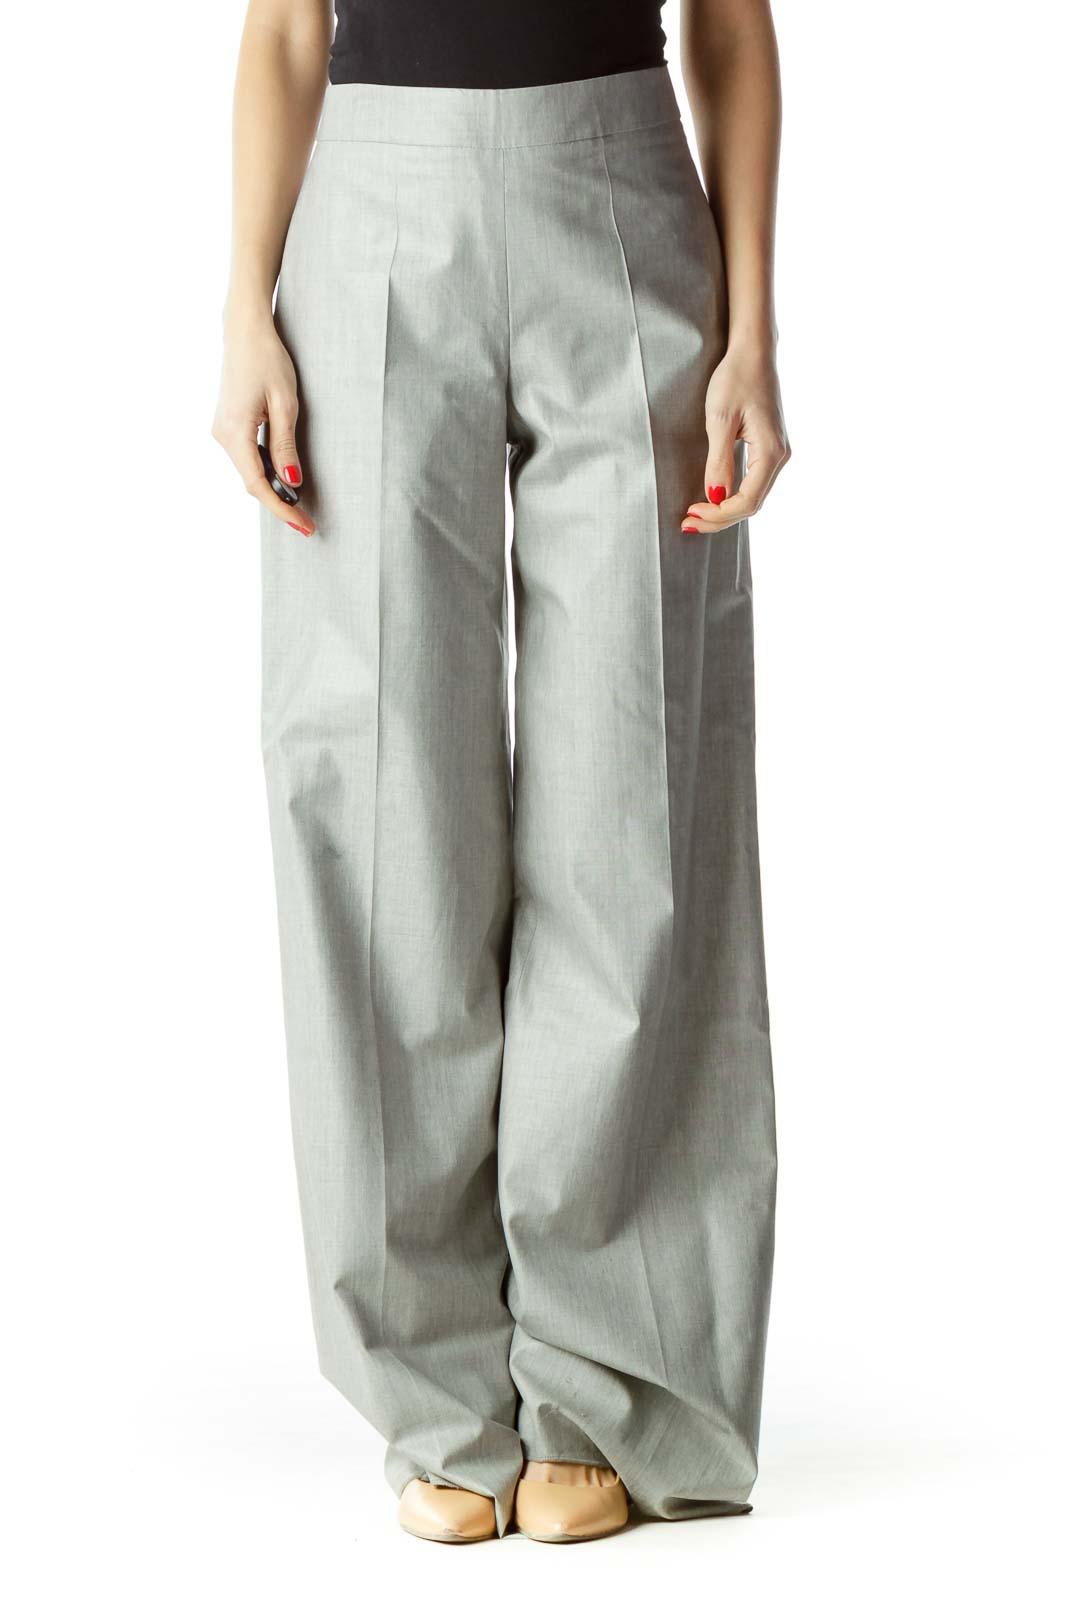 Gray High-Waisted Designer Dress Pants Front